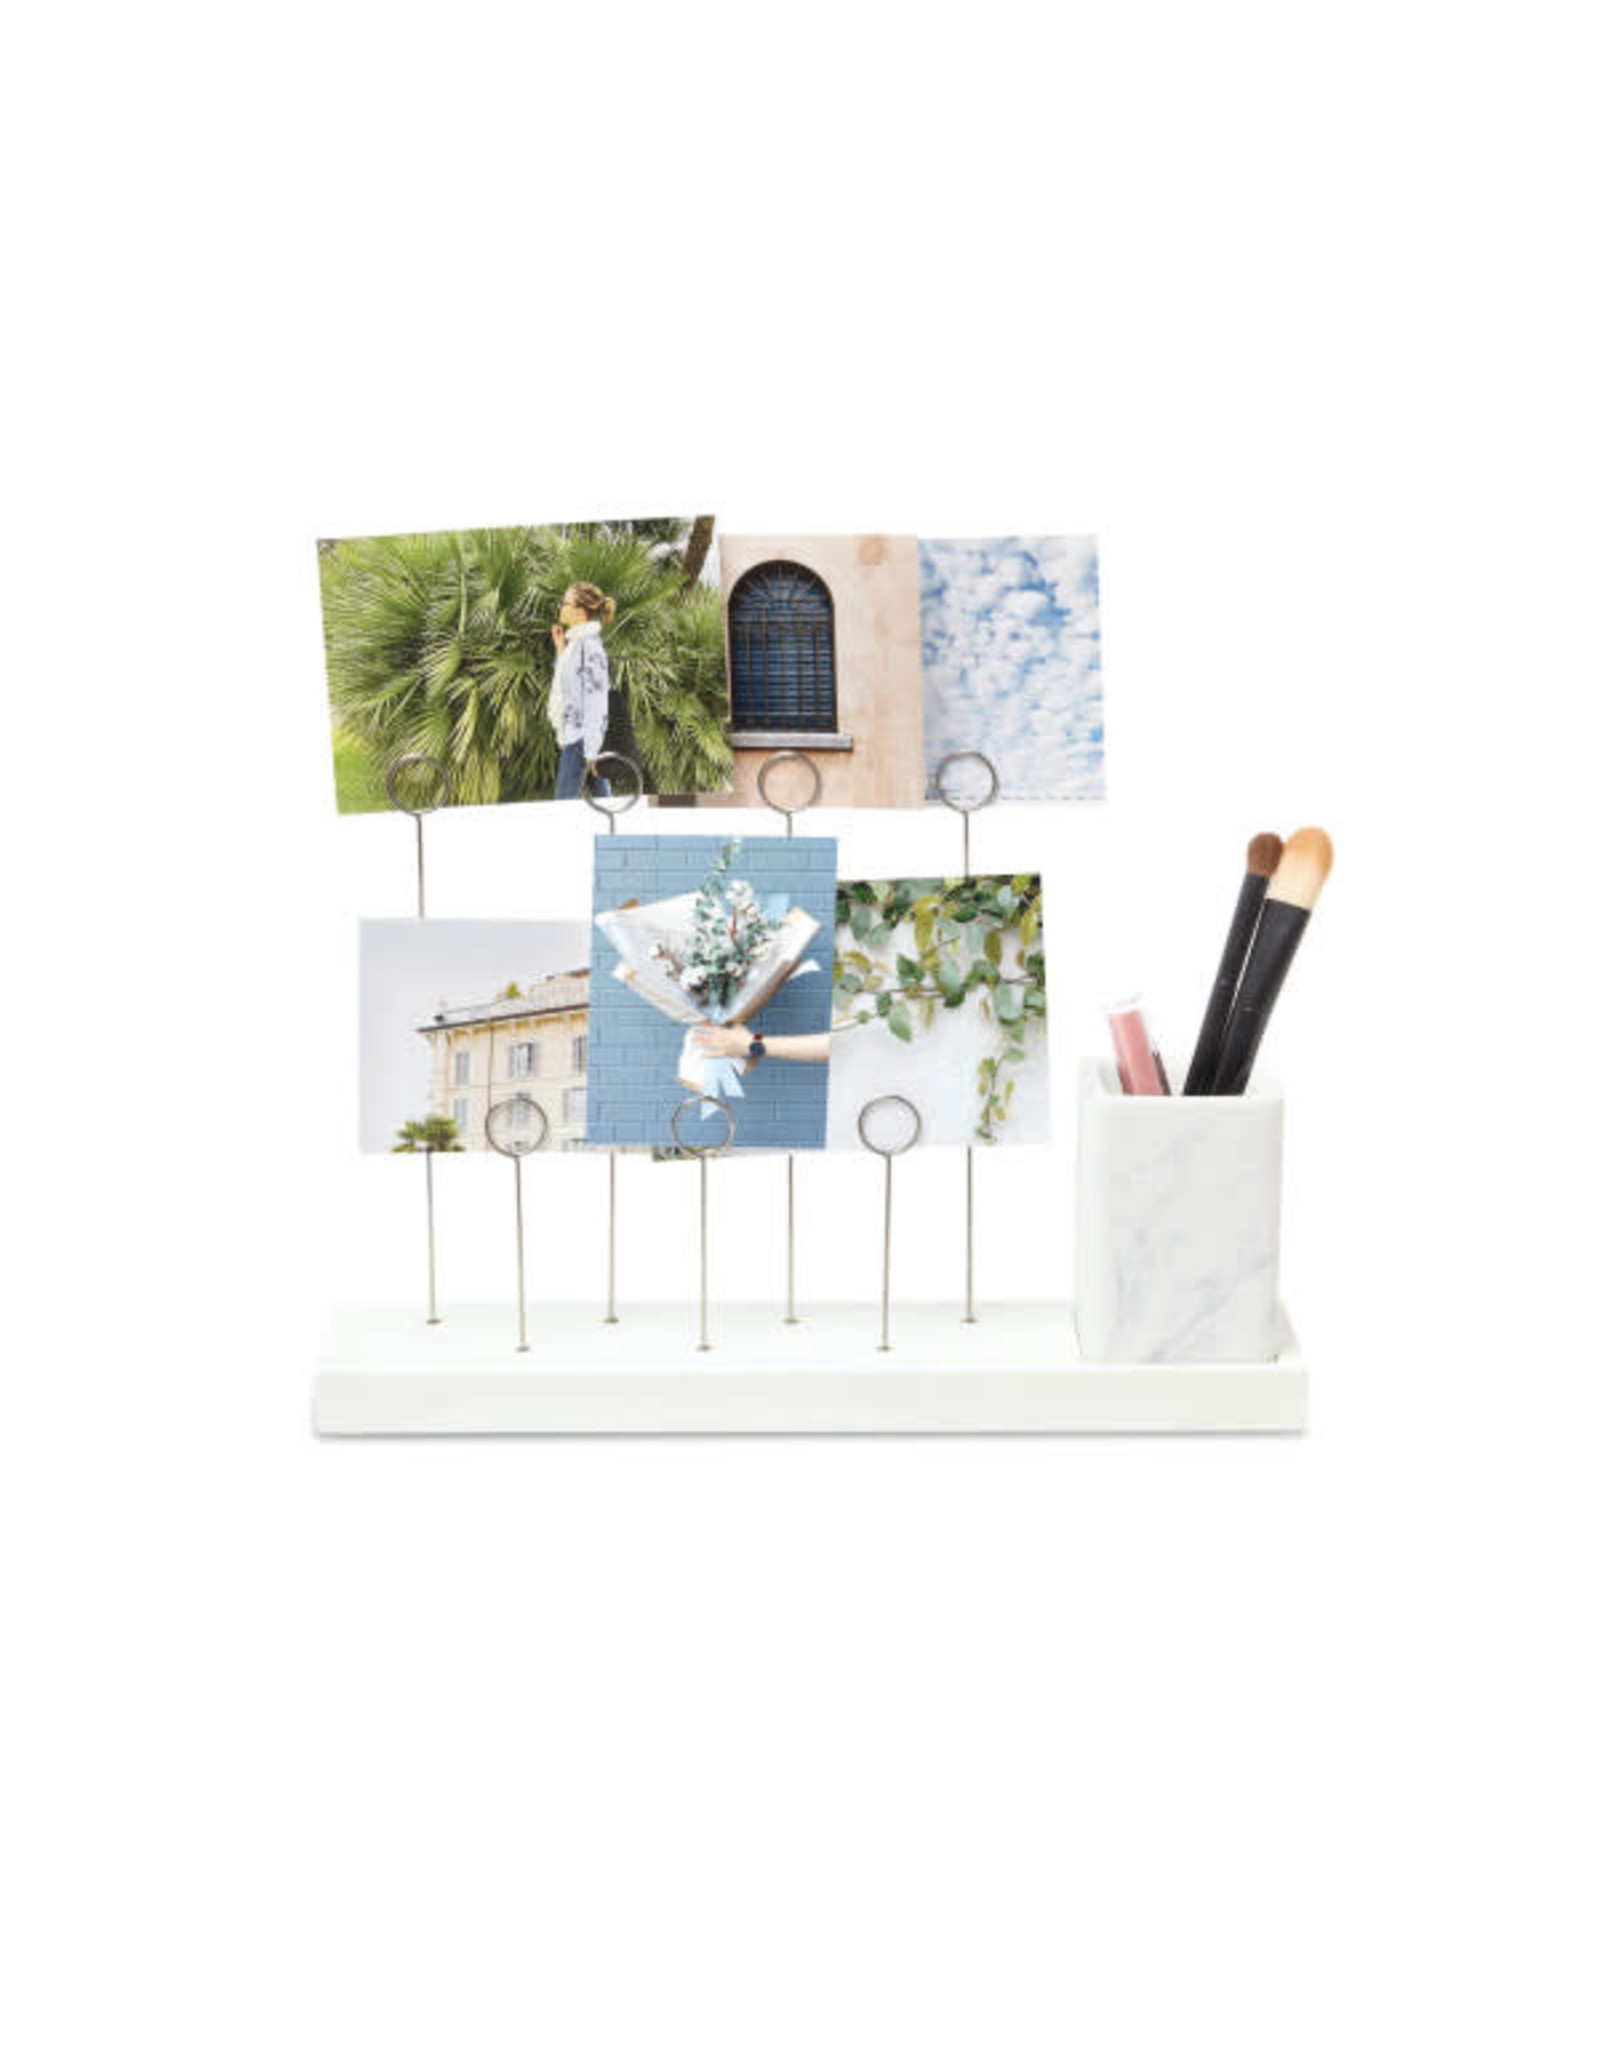 Umbra Gala fotoclips & pennenhouder (marmer/wit)